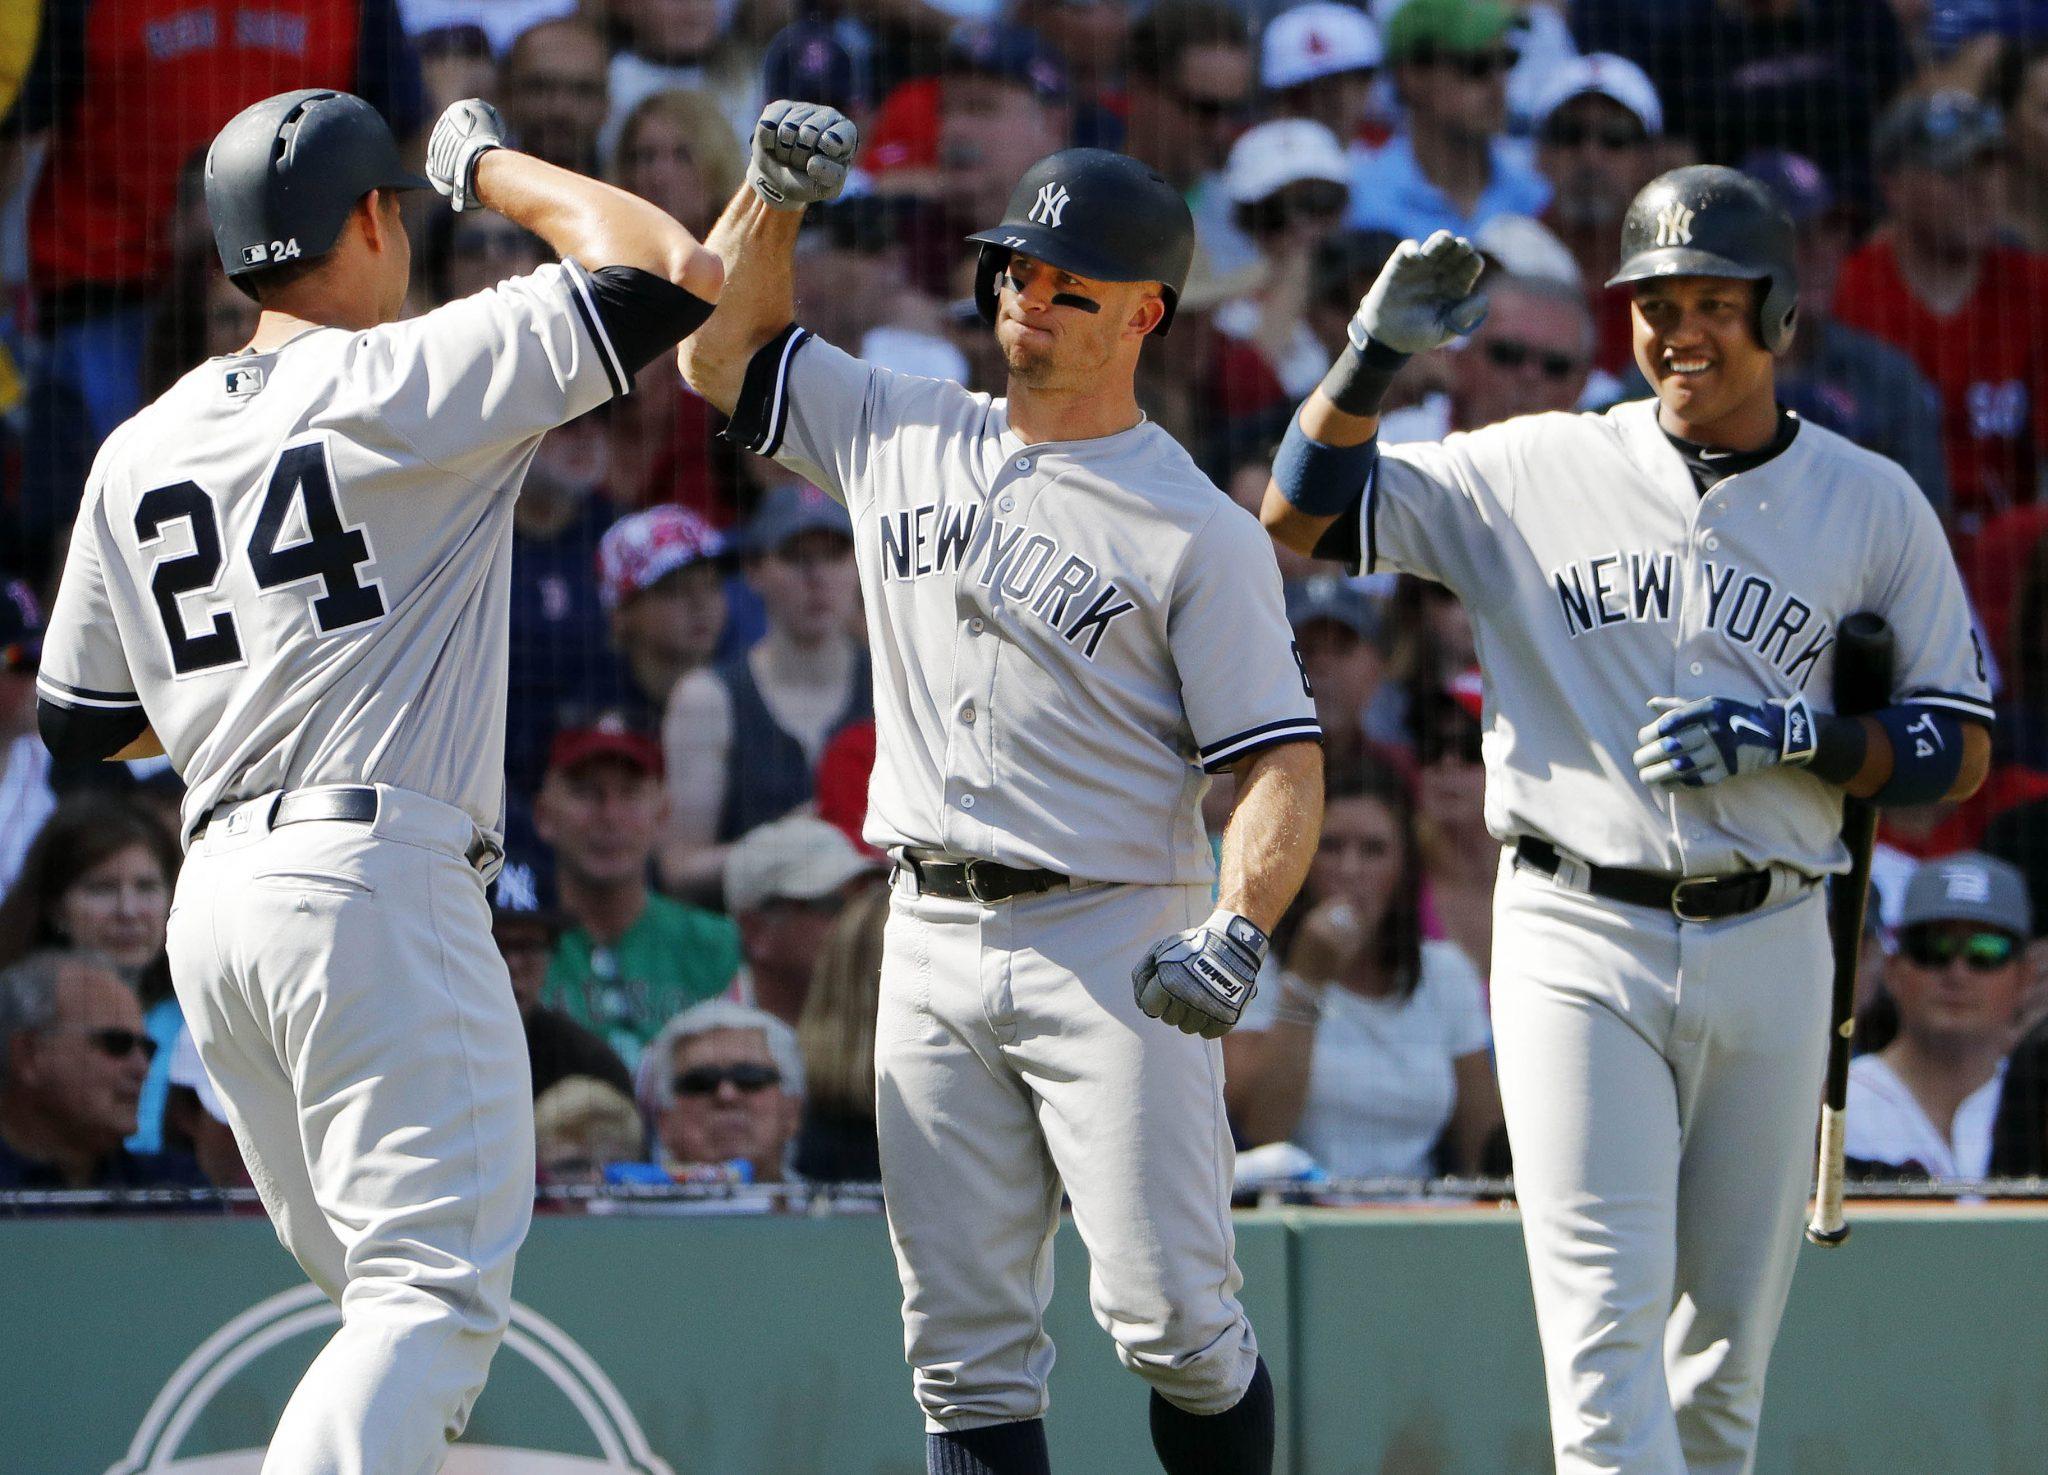 New York Yankees Wallpapers Hq